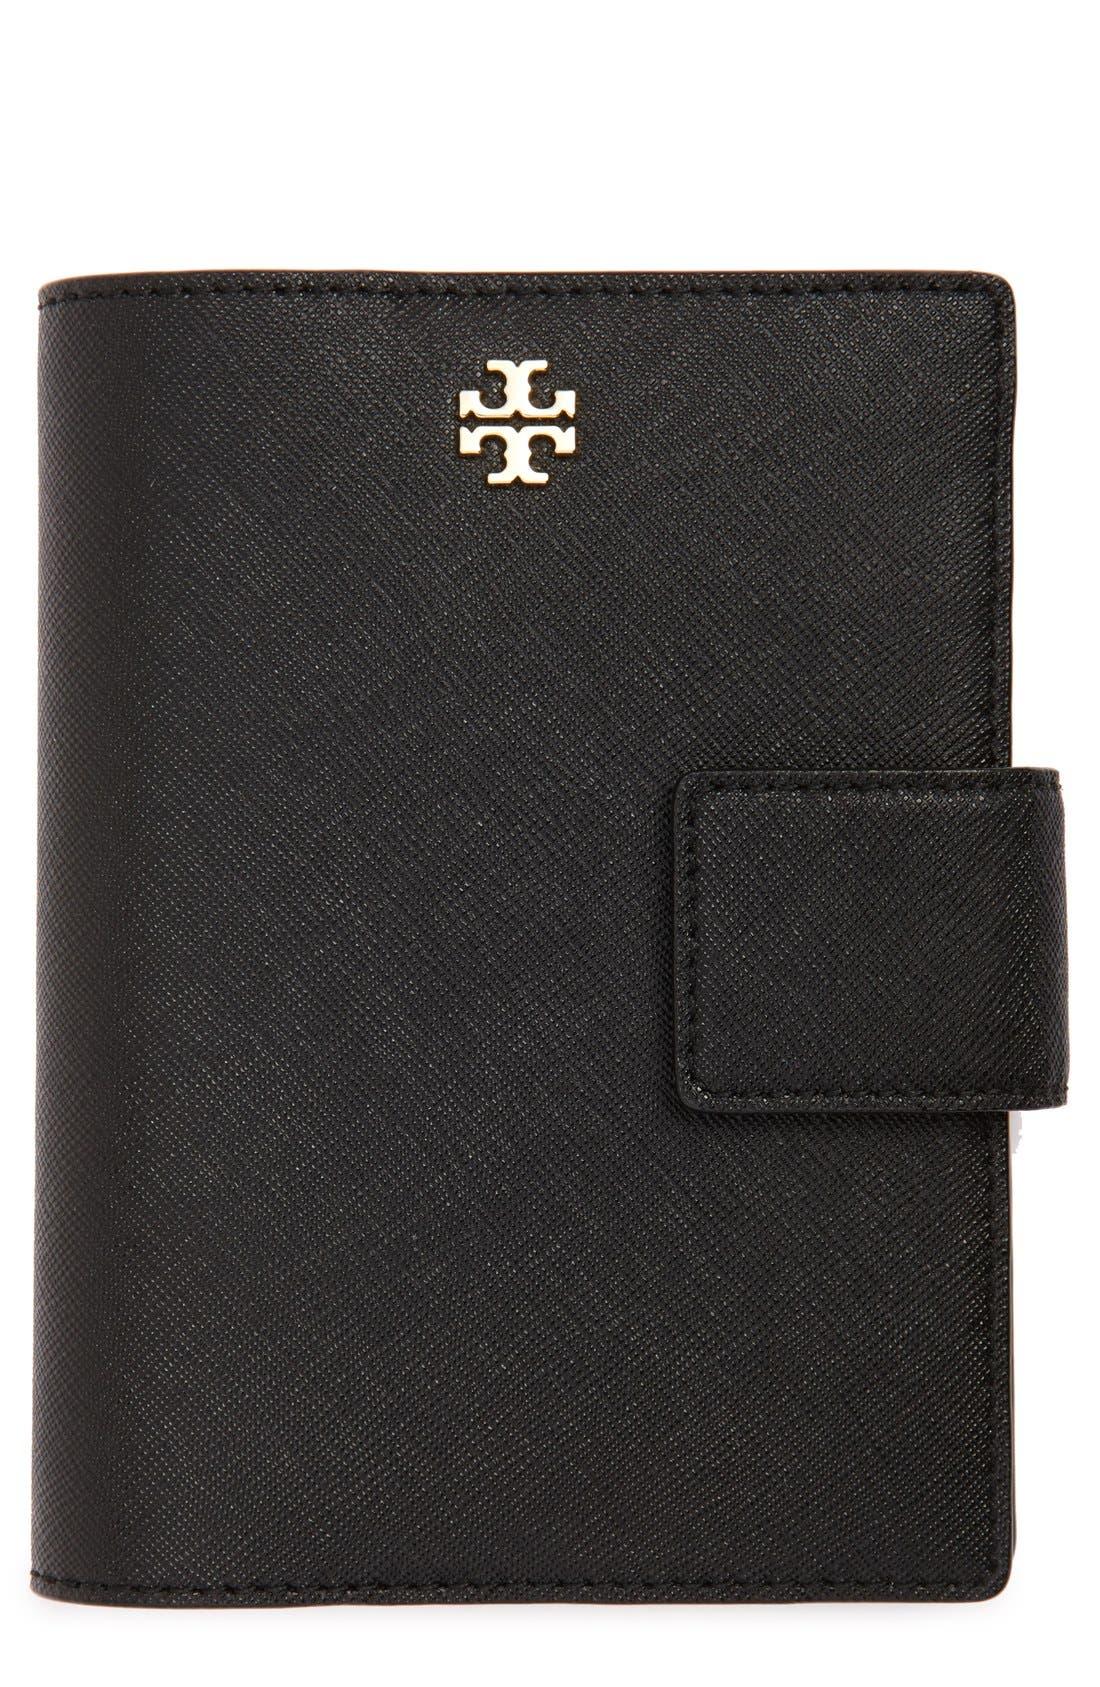 Alternate Image 1 Selected - Tory Burch 'Robinson' Passport Holder